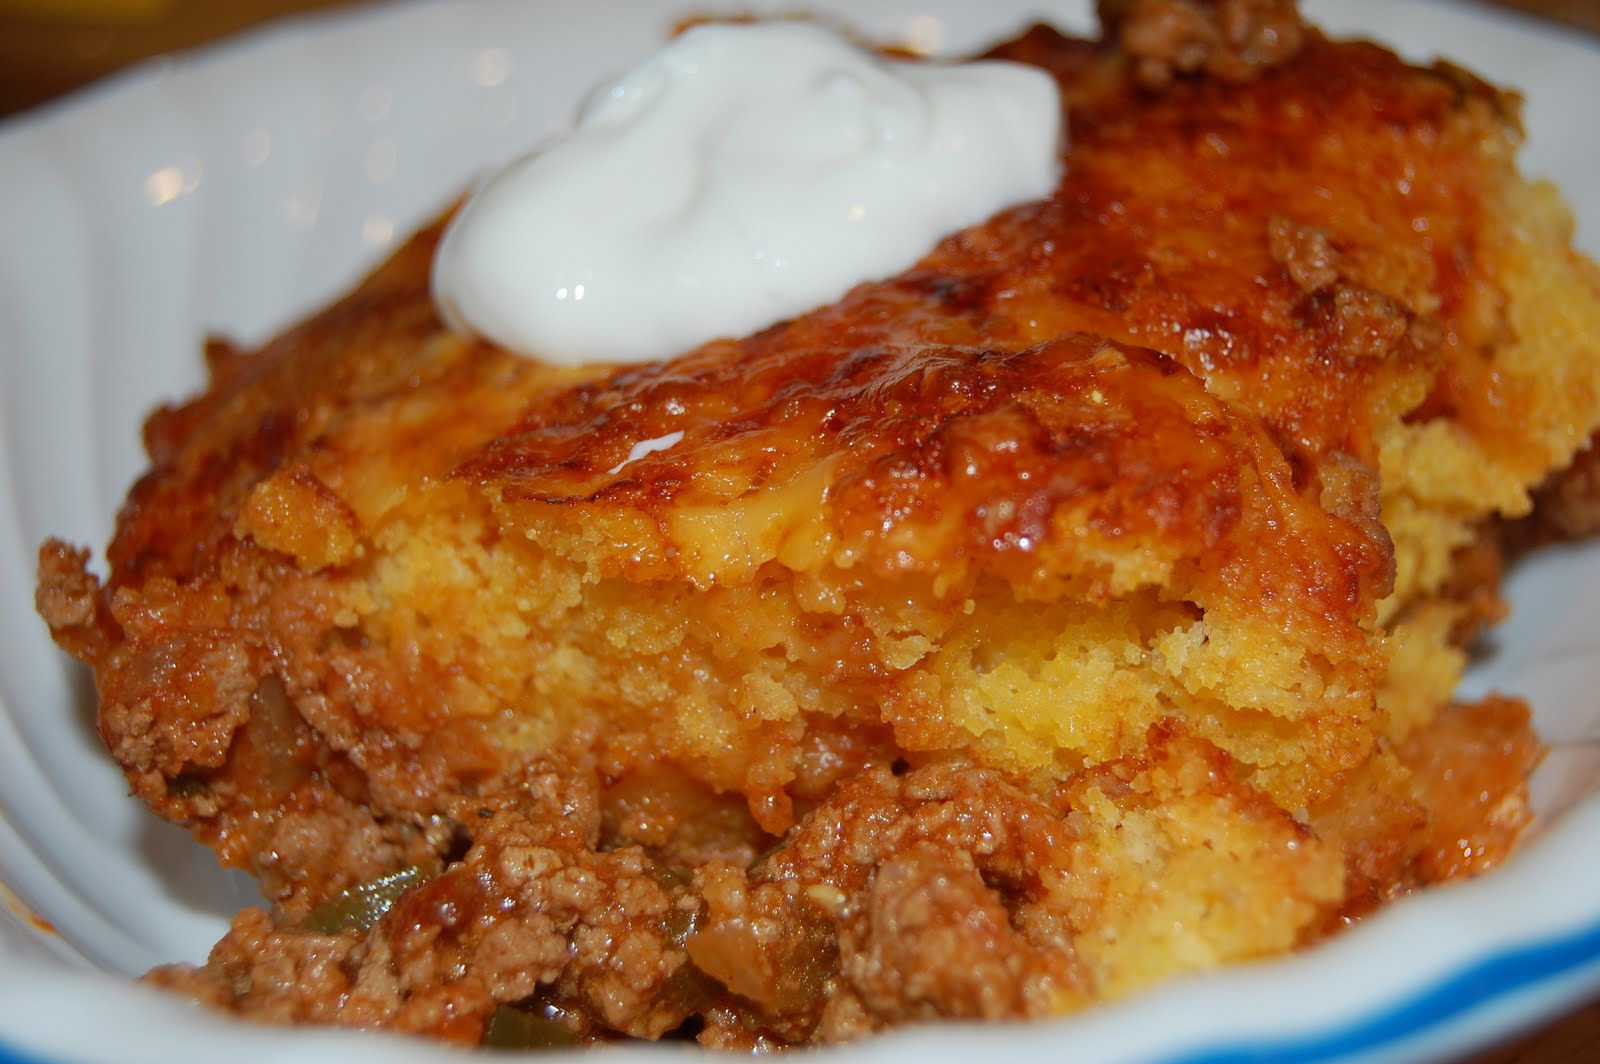 ... turkey pho turkey pad see ew turkey meatballs turkey tamale pot pie